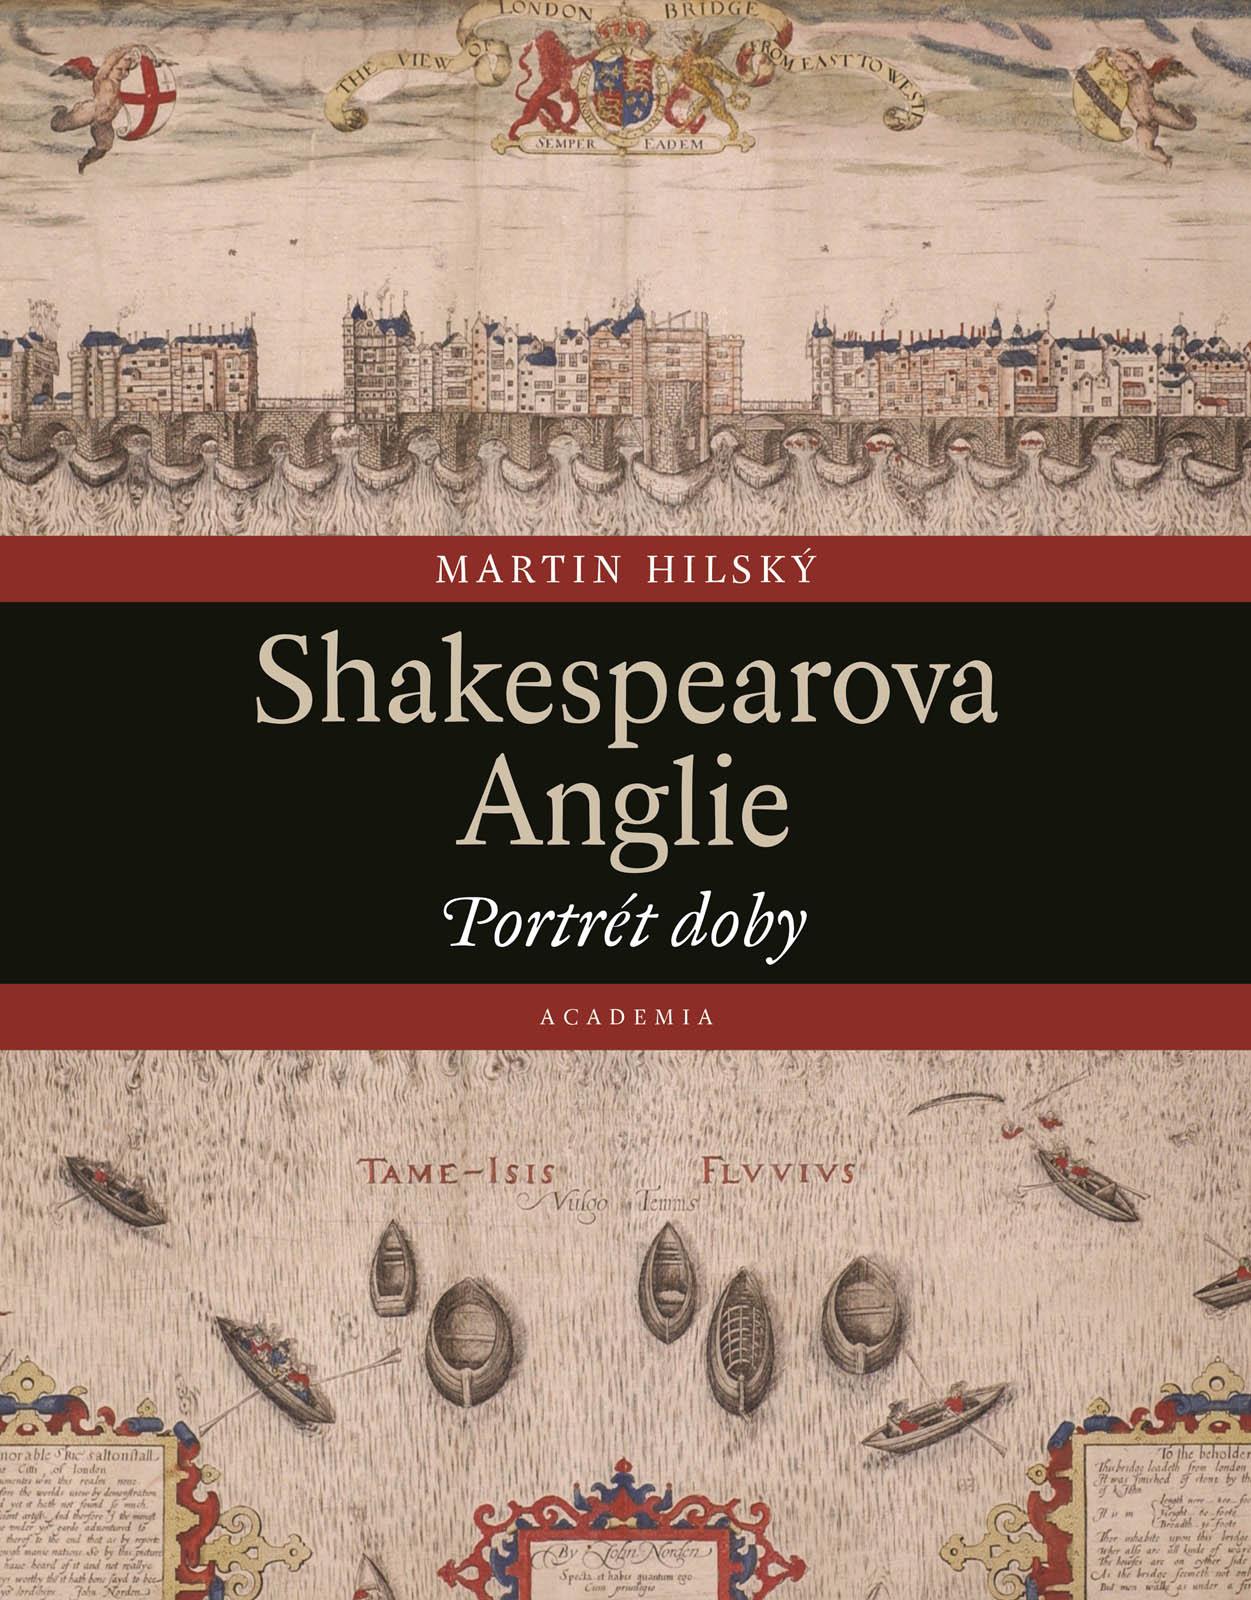 Martin Hilský Shakespearova Anglie: Portrét doby (nakladatelství Academia, Praha, 2020, 765 s.)